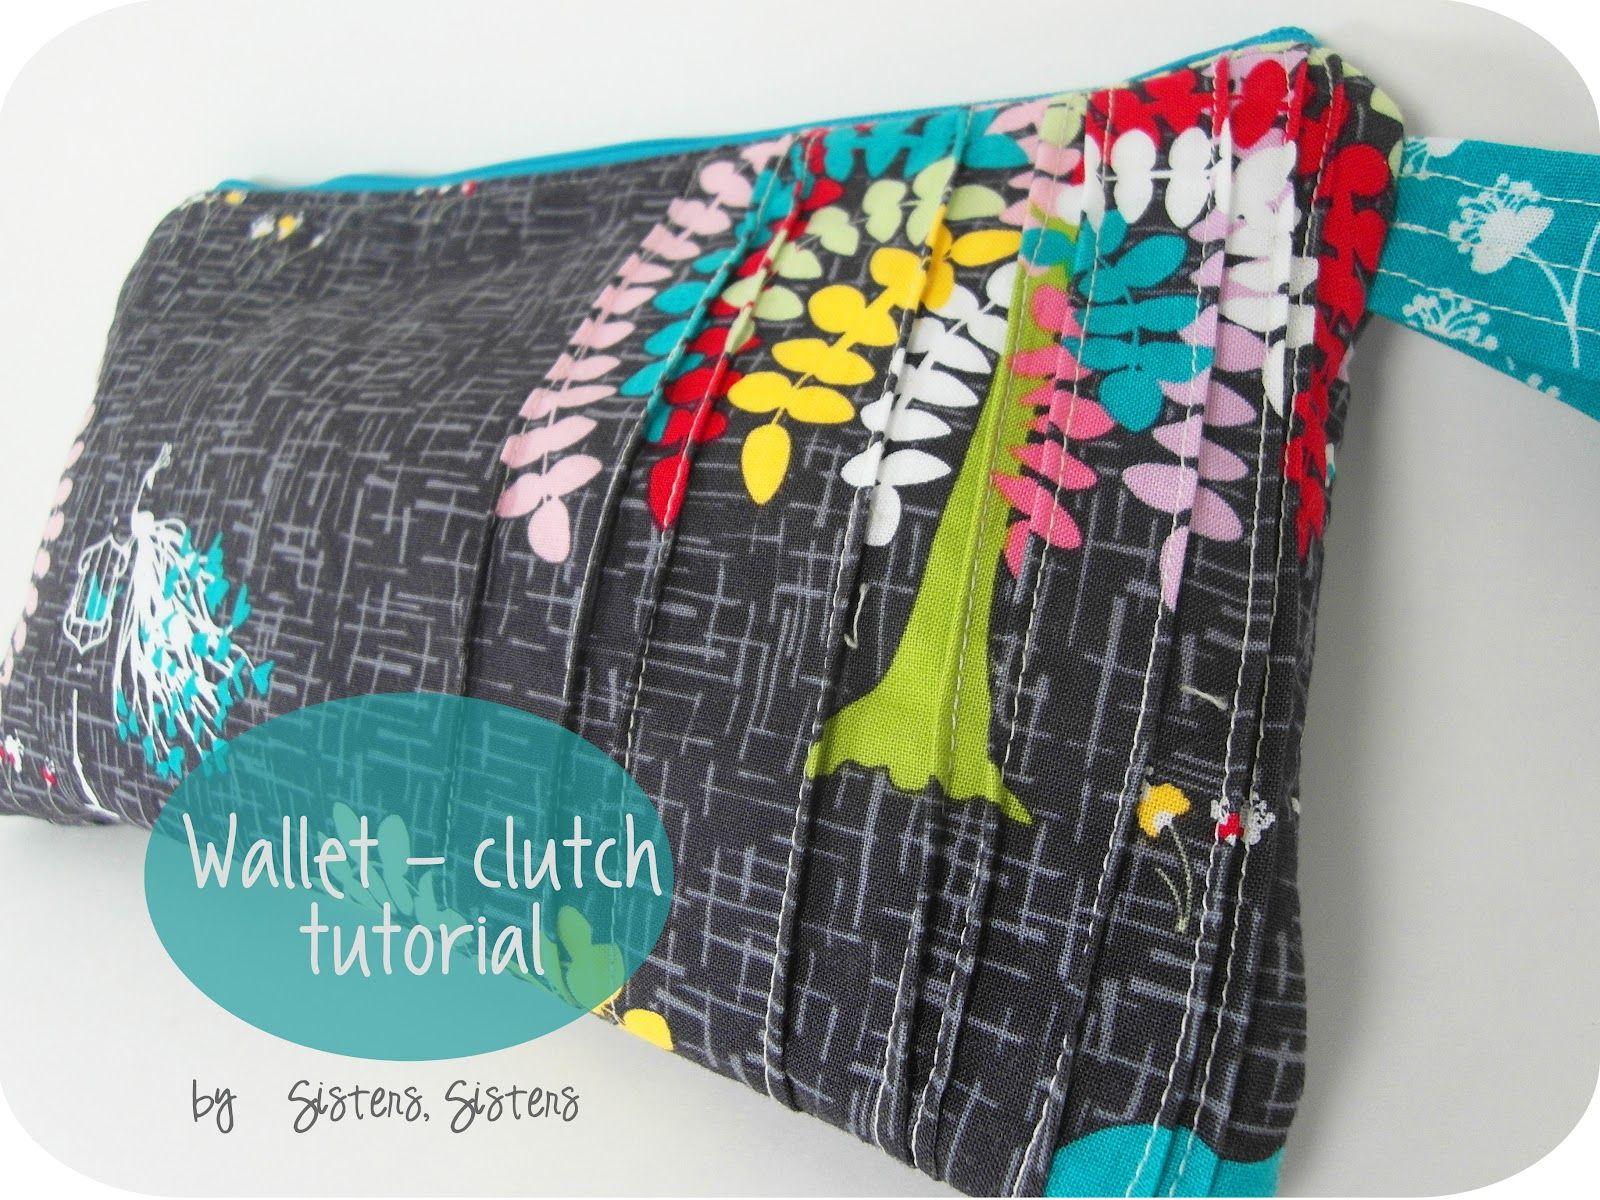 Wallet clutch tutorial sewing pinterest clutch tutorial wallet clutch tutorial jeuxipadfo Gallery